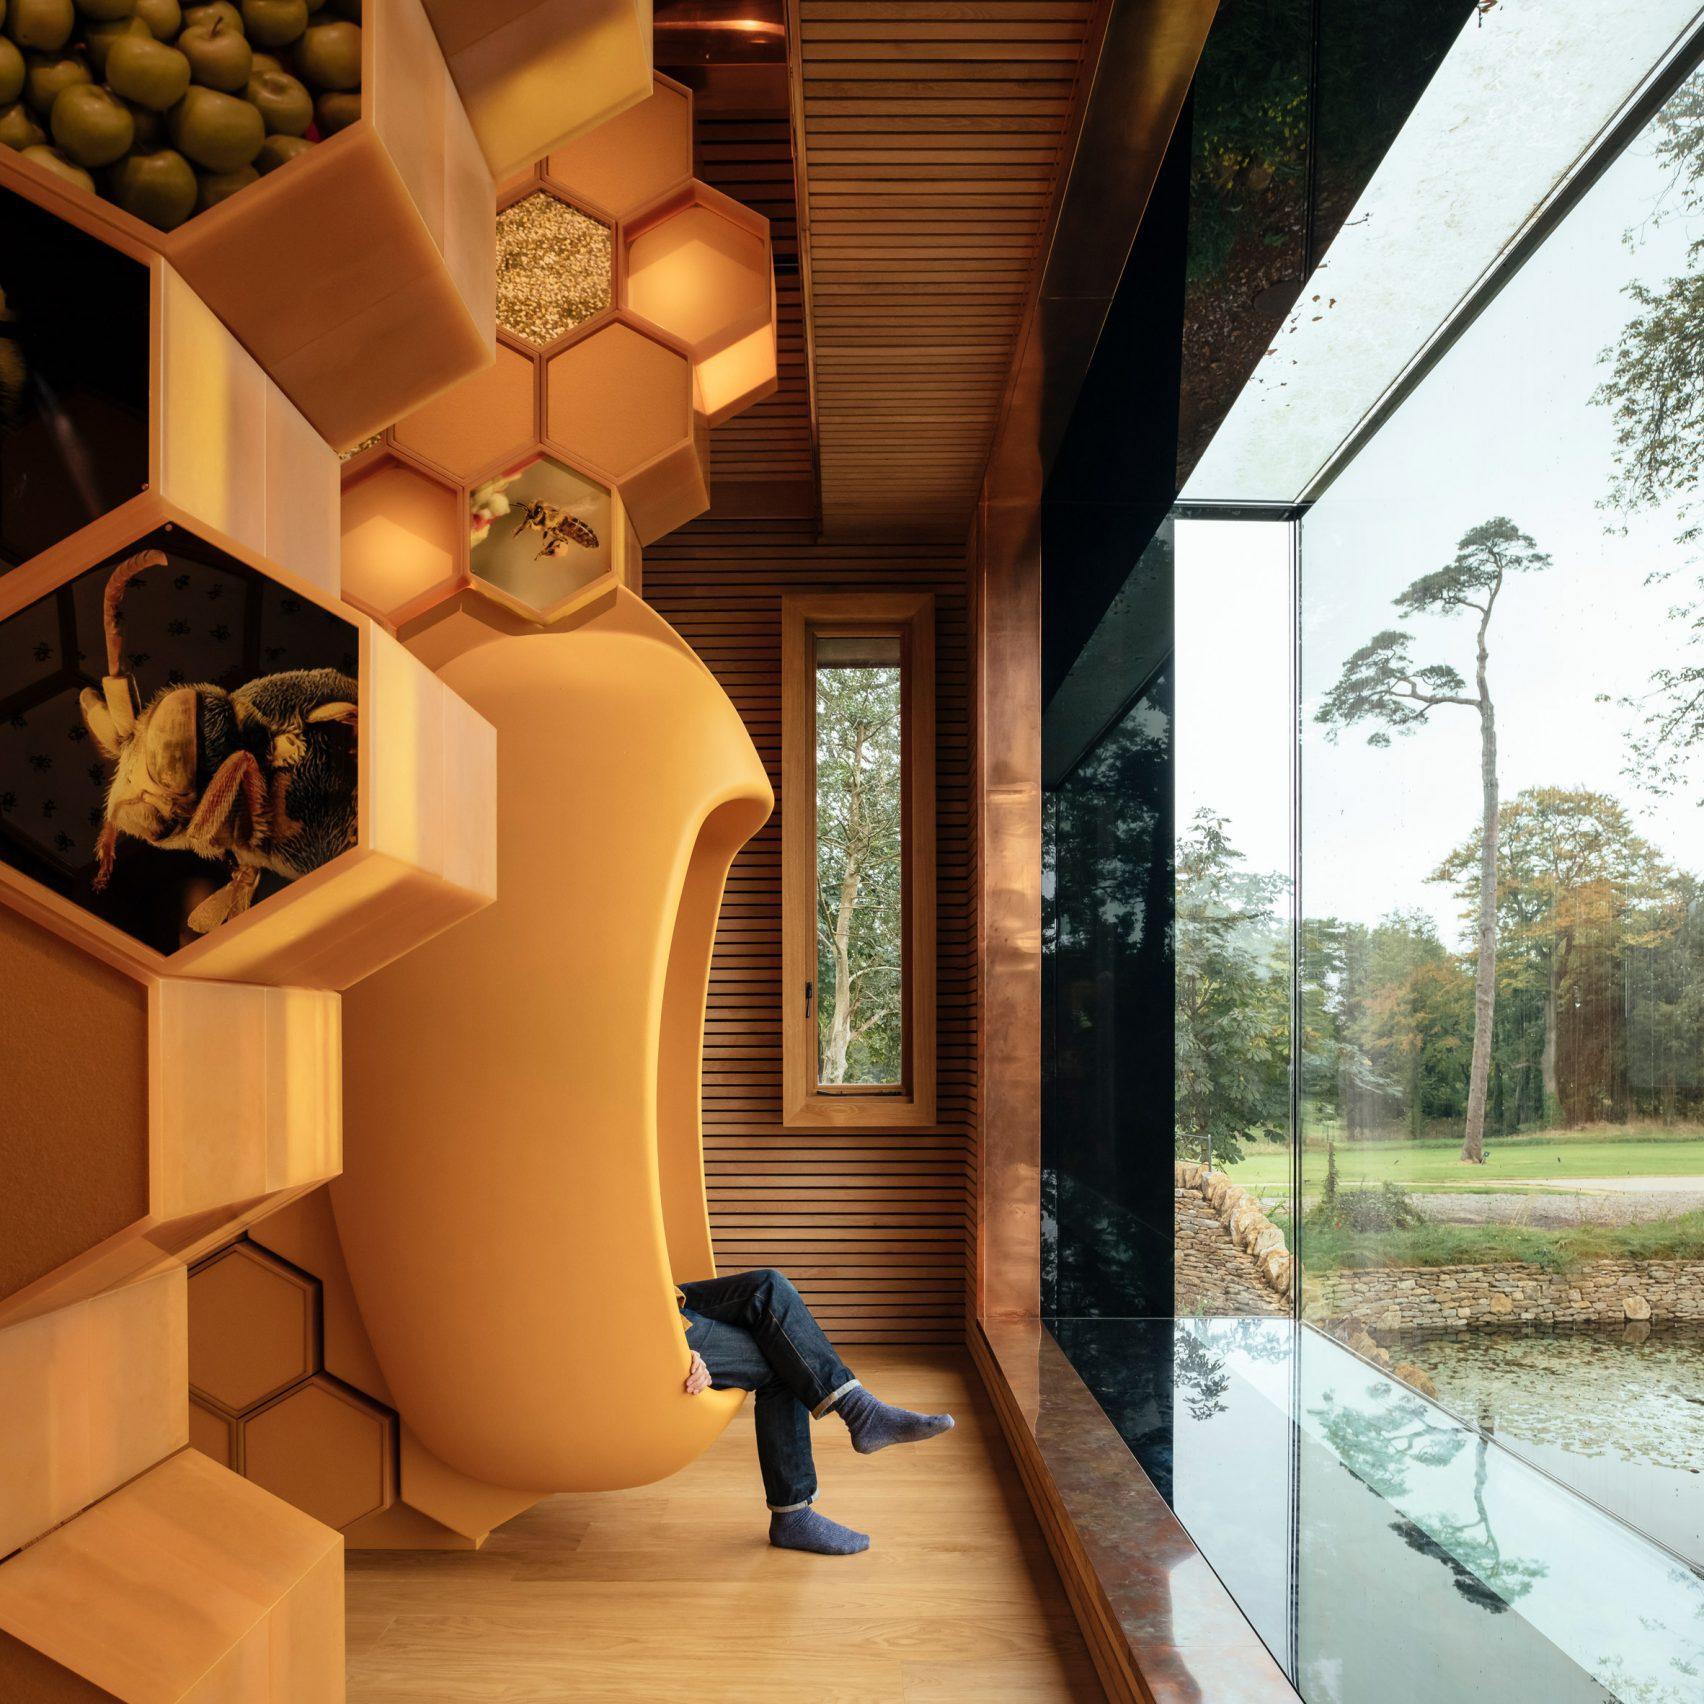 waterside-bee-hotel-apiary-newt-hotel_eclectictrends